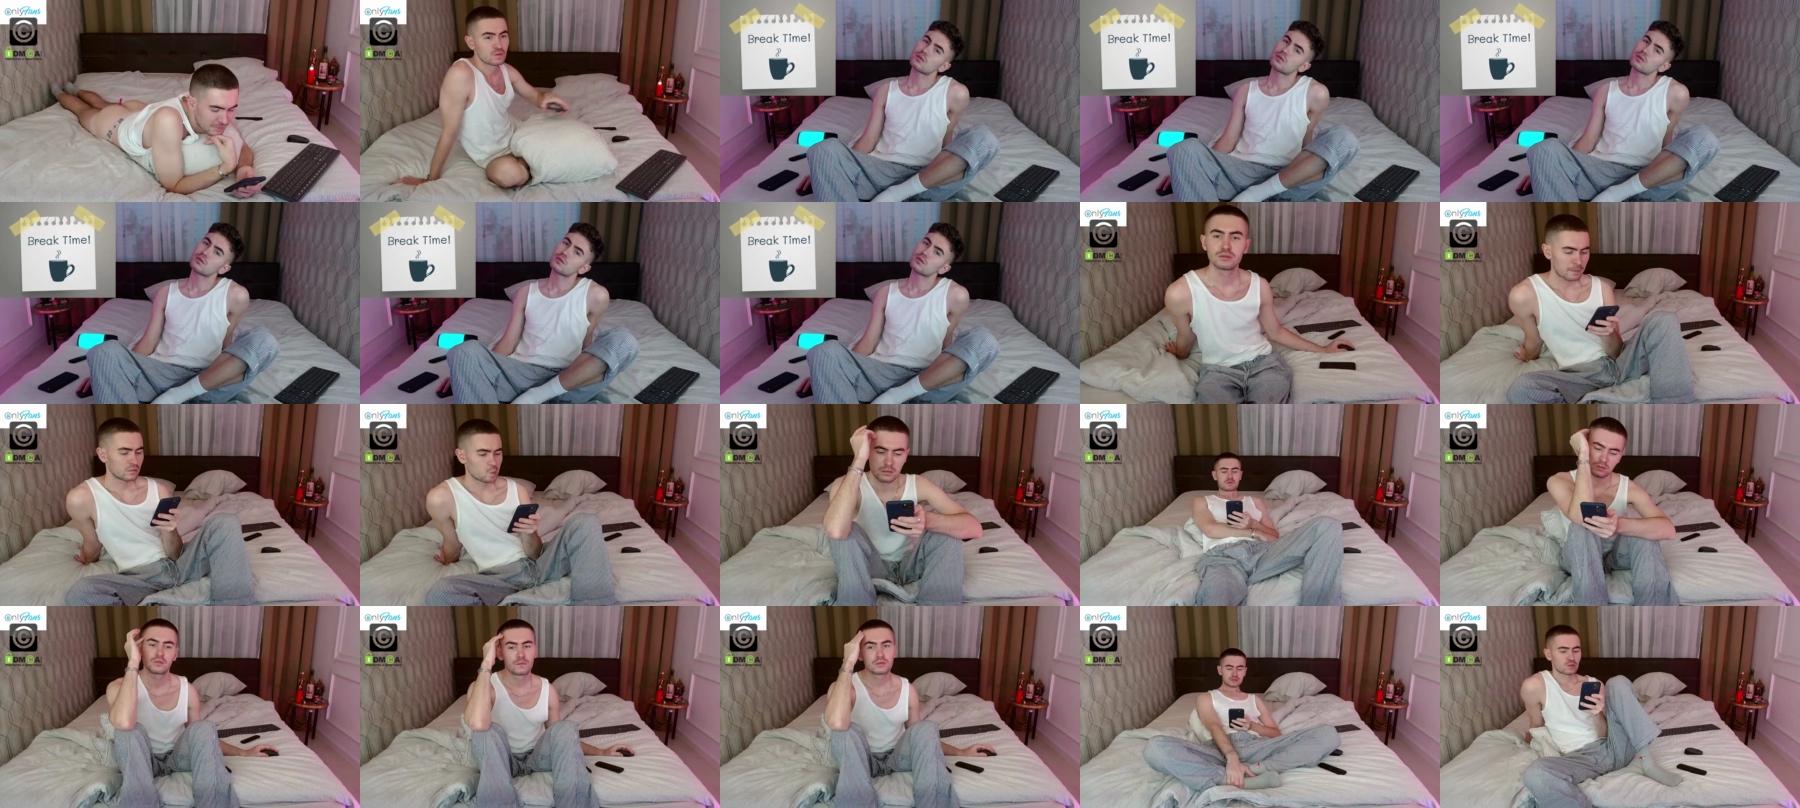 Ben_3vlas Chaturbate 18-09-2021 video girl